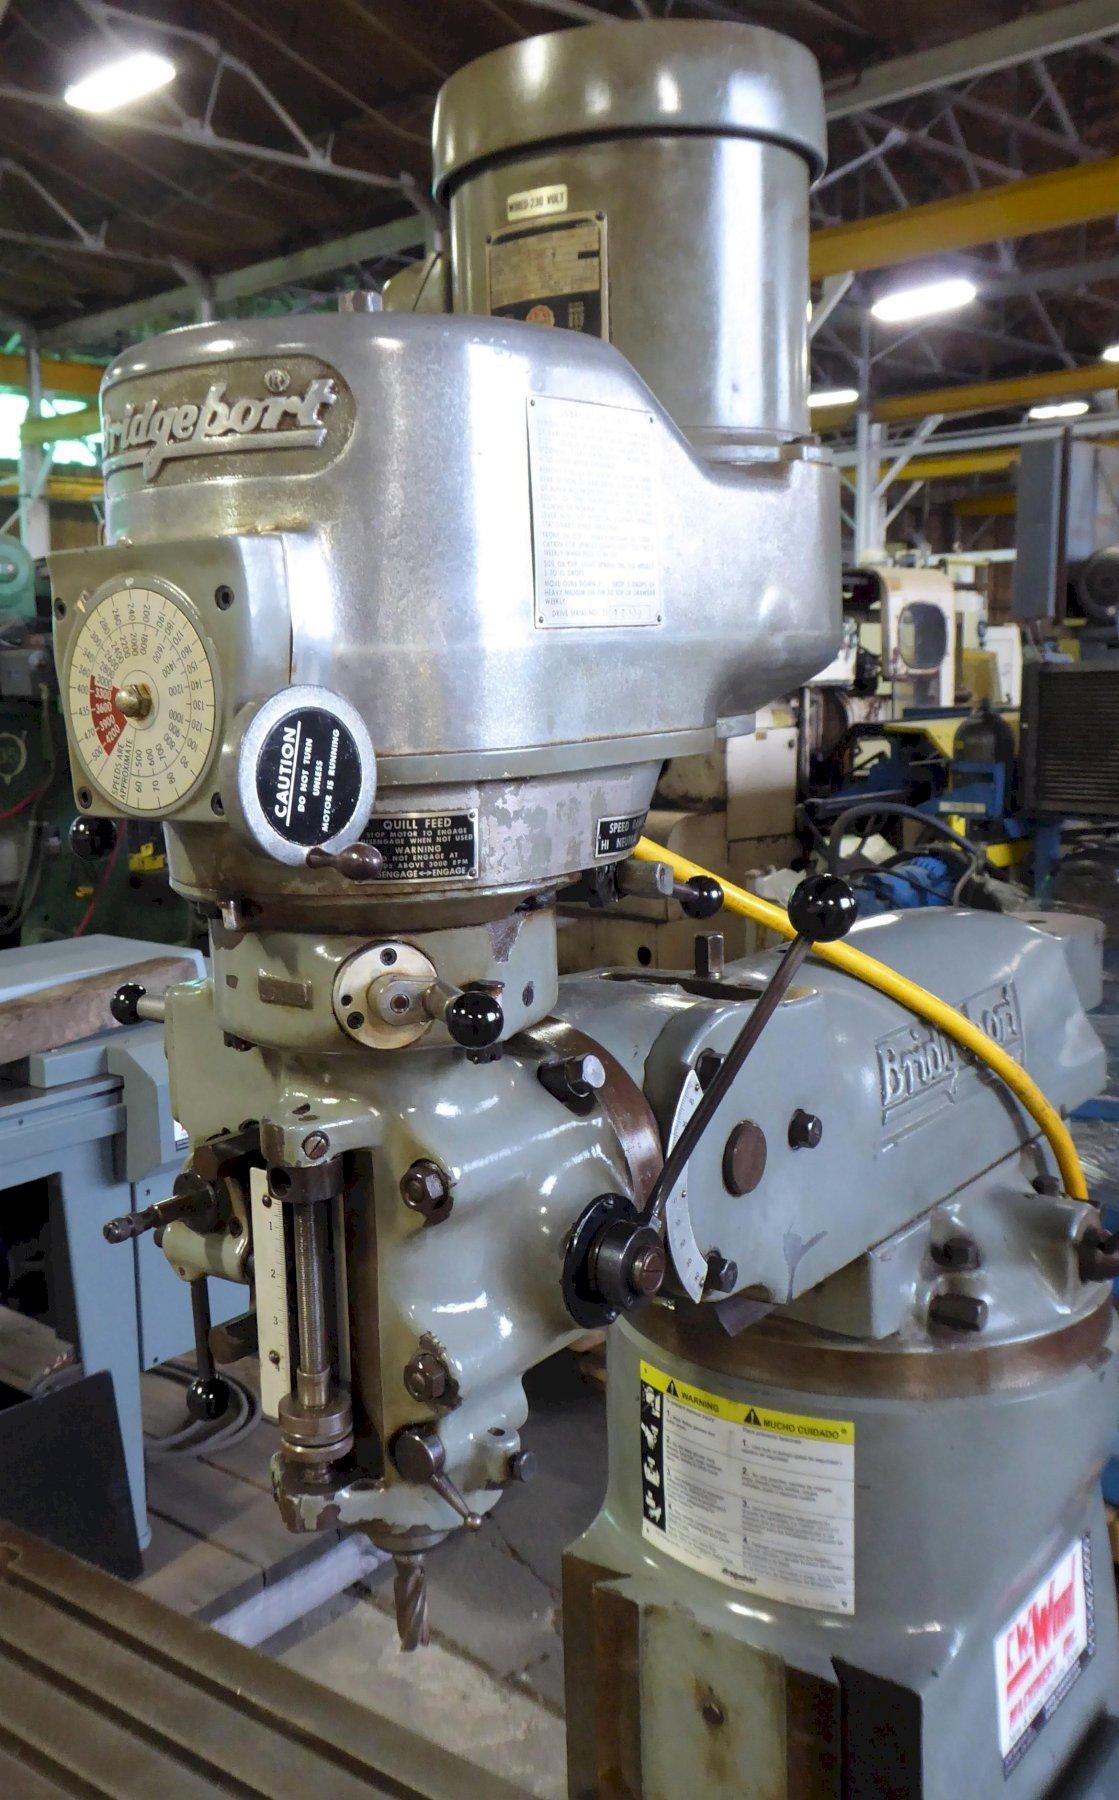 "Bridgeport Vertical Mill Series I, 9"" x 42"" PF Tbl., 1-1/2 HP, Clean"